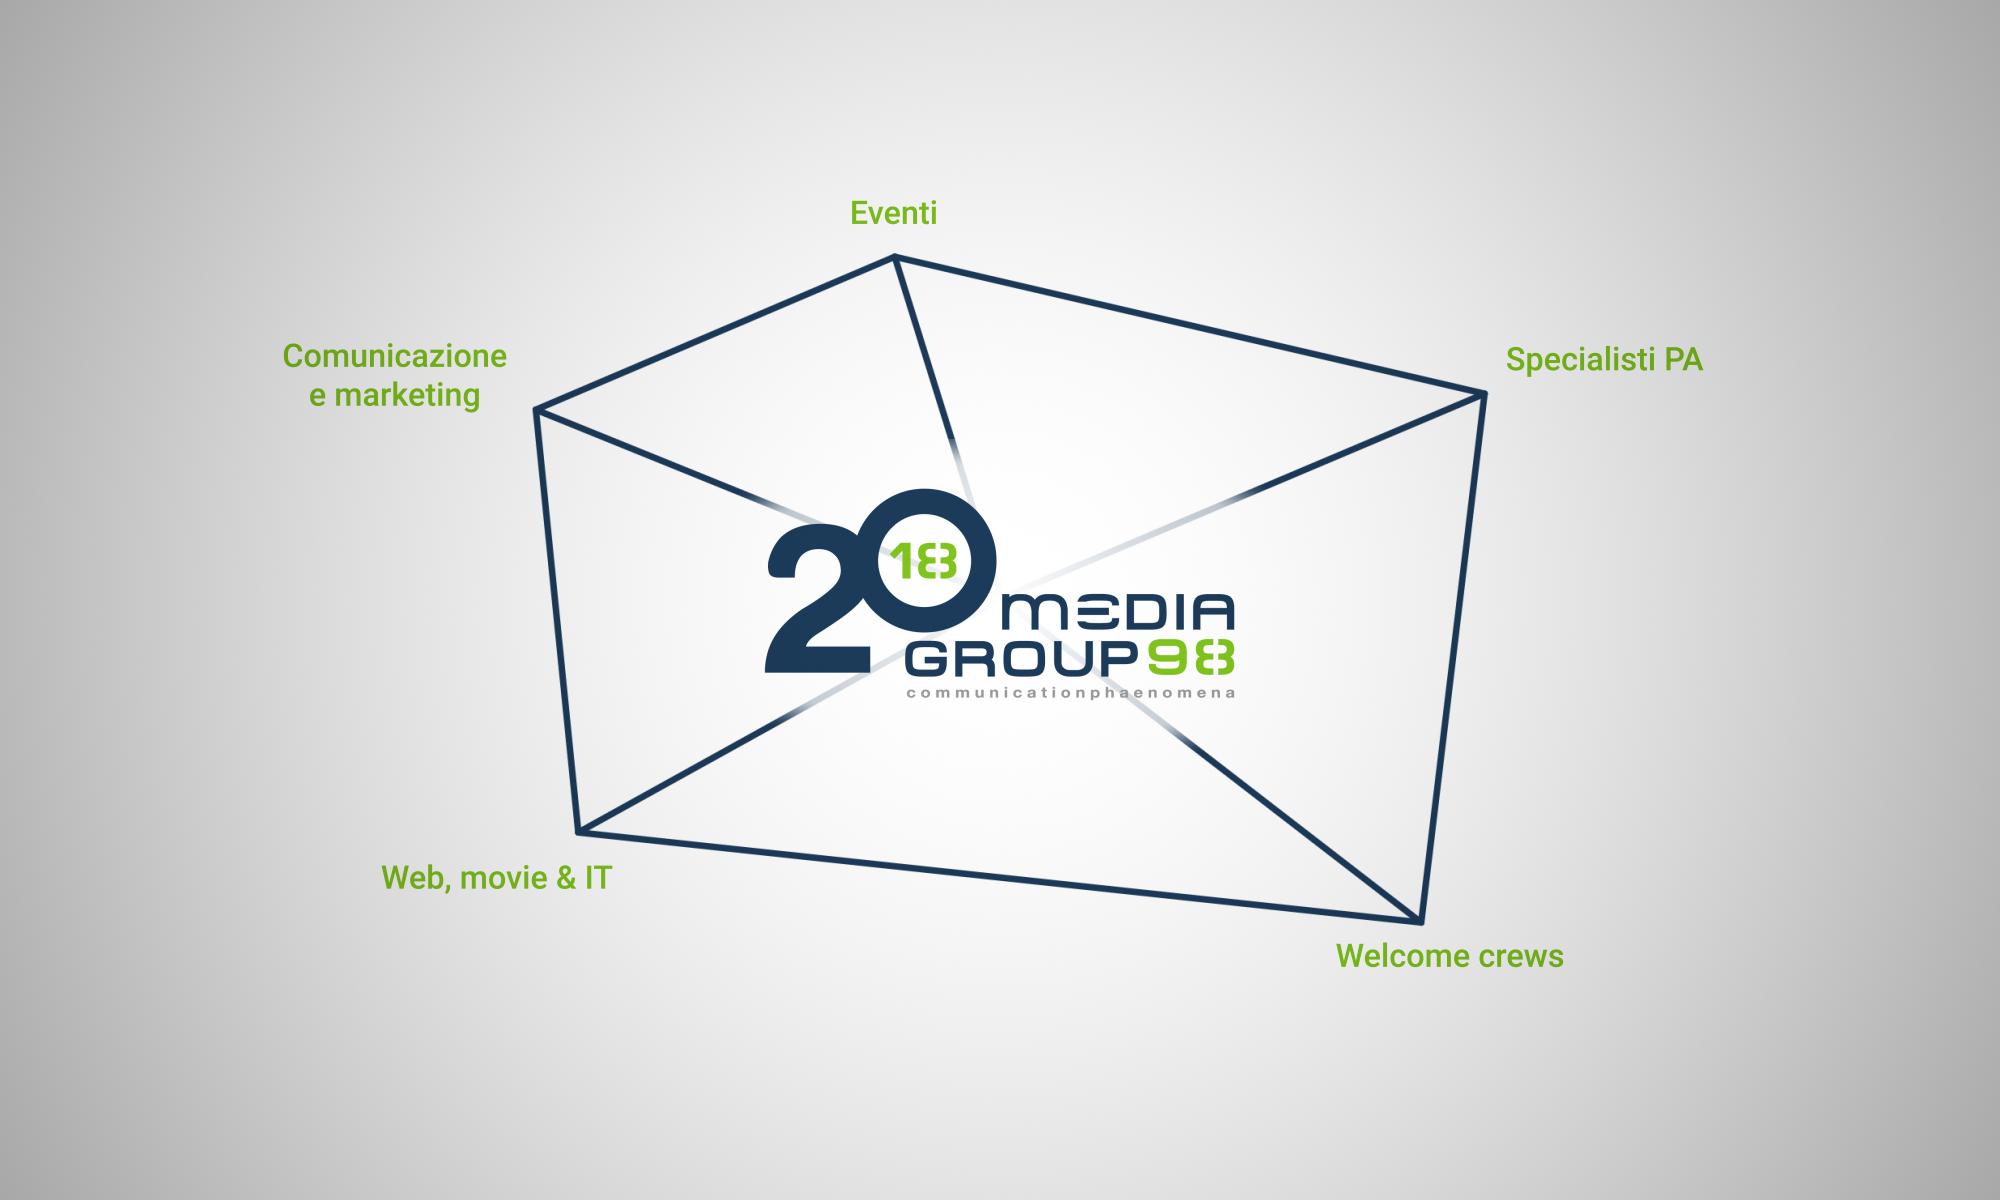 Mediagroup98